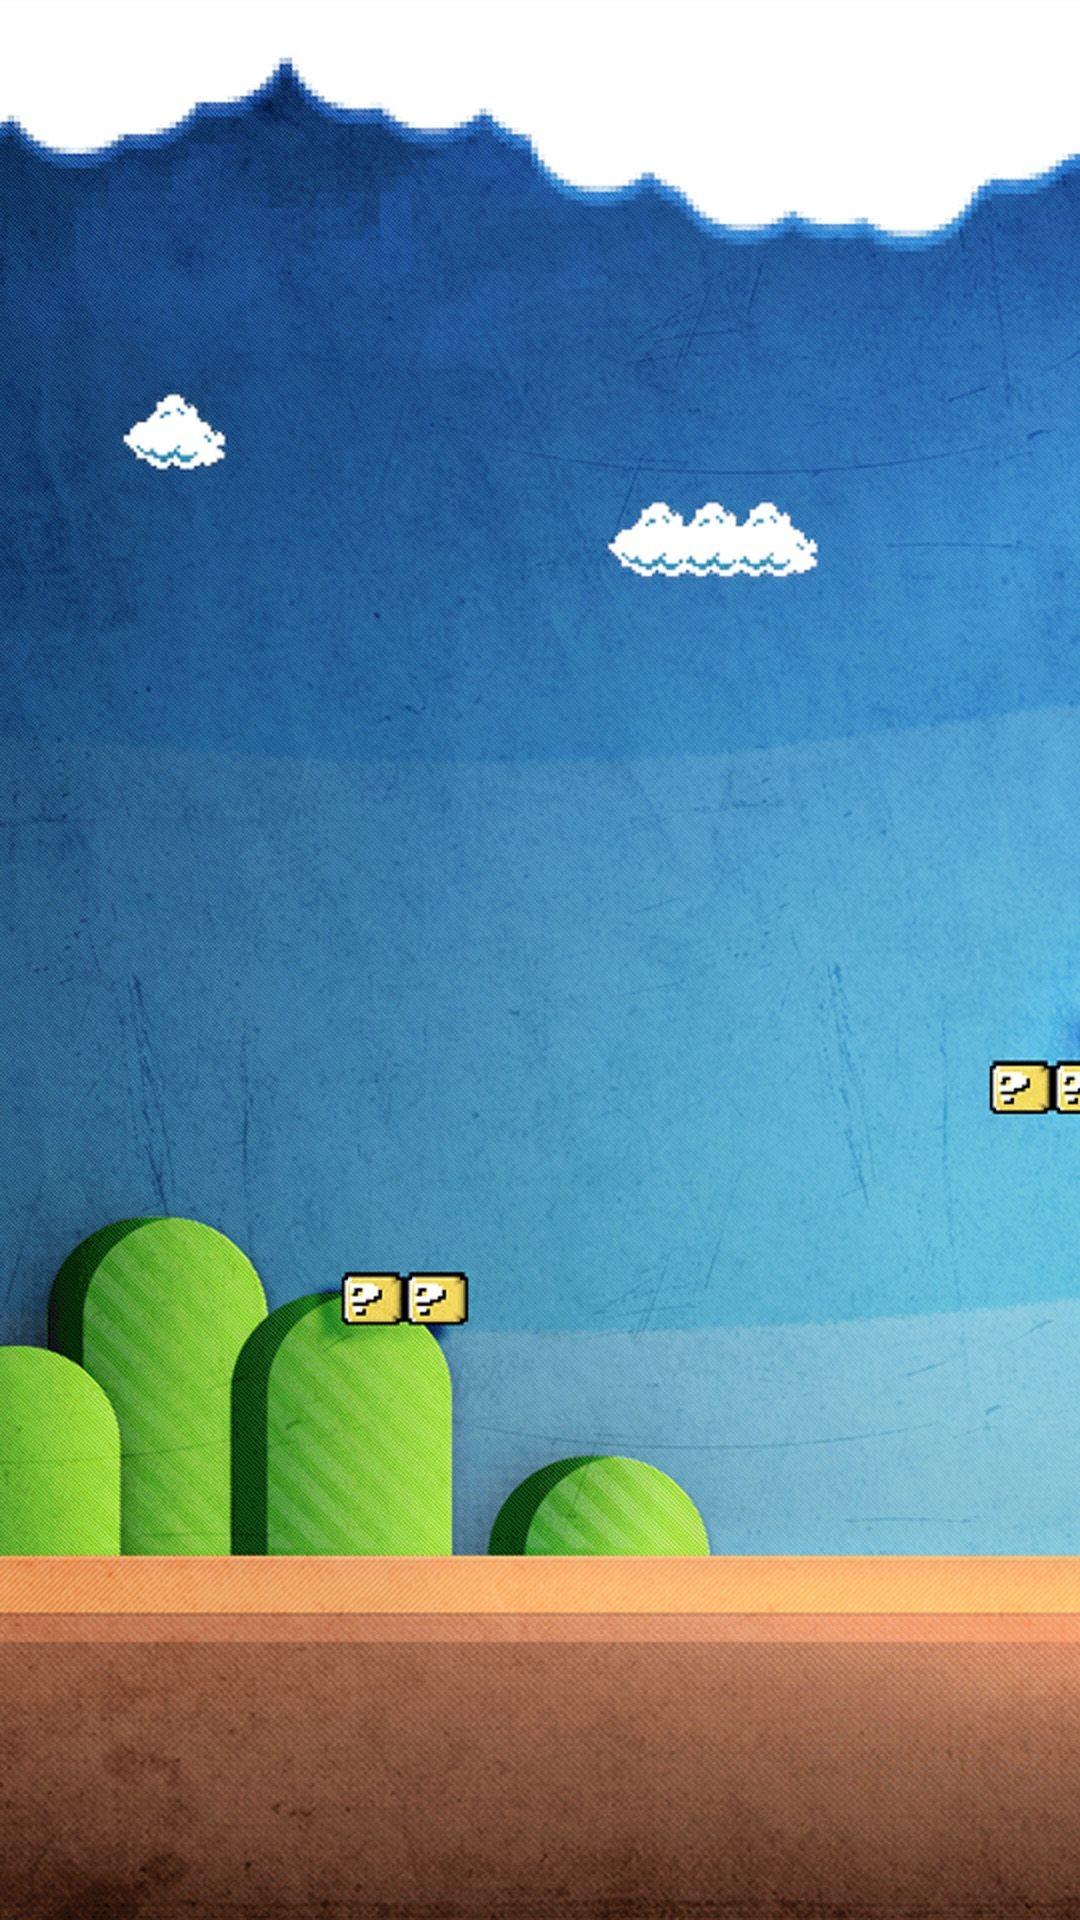 Res: 1080x1920, Super Mario wallpaper. Nintendo, Mario, map, game, iphone, android,  wallpaper.